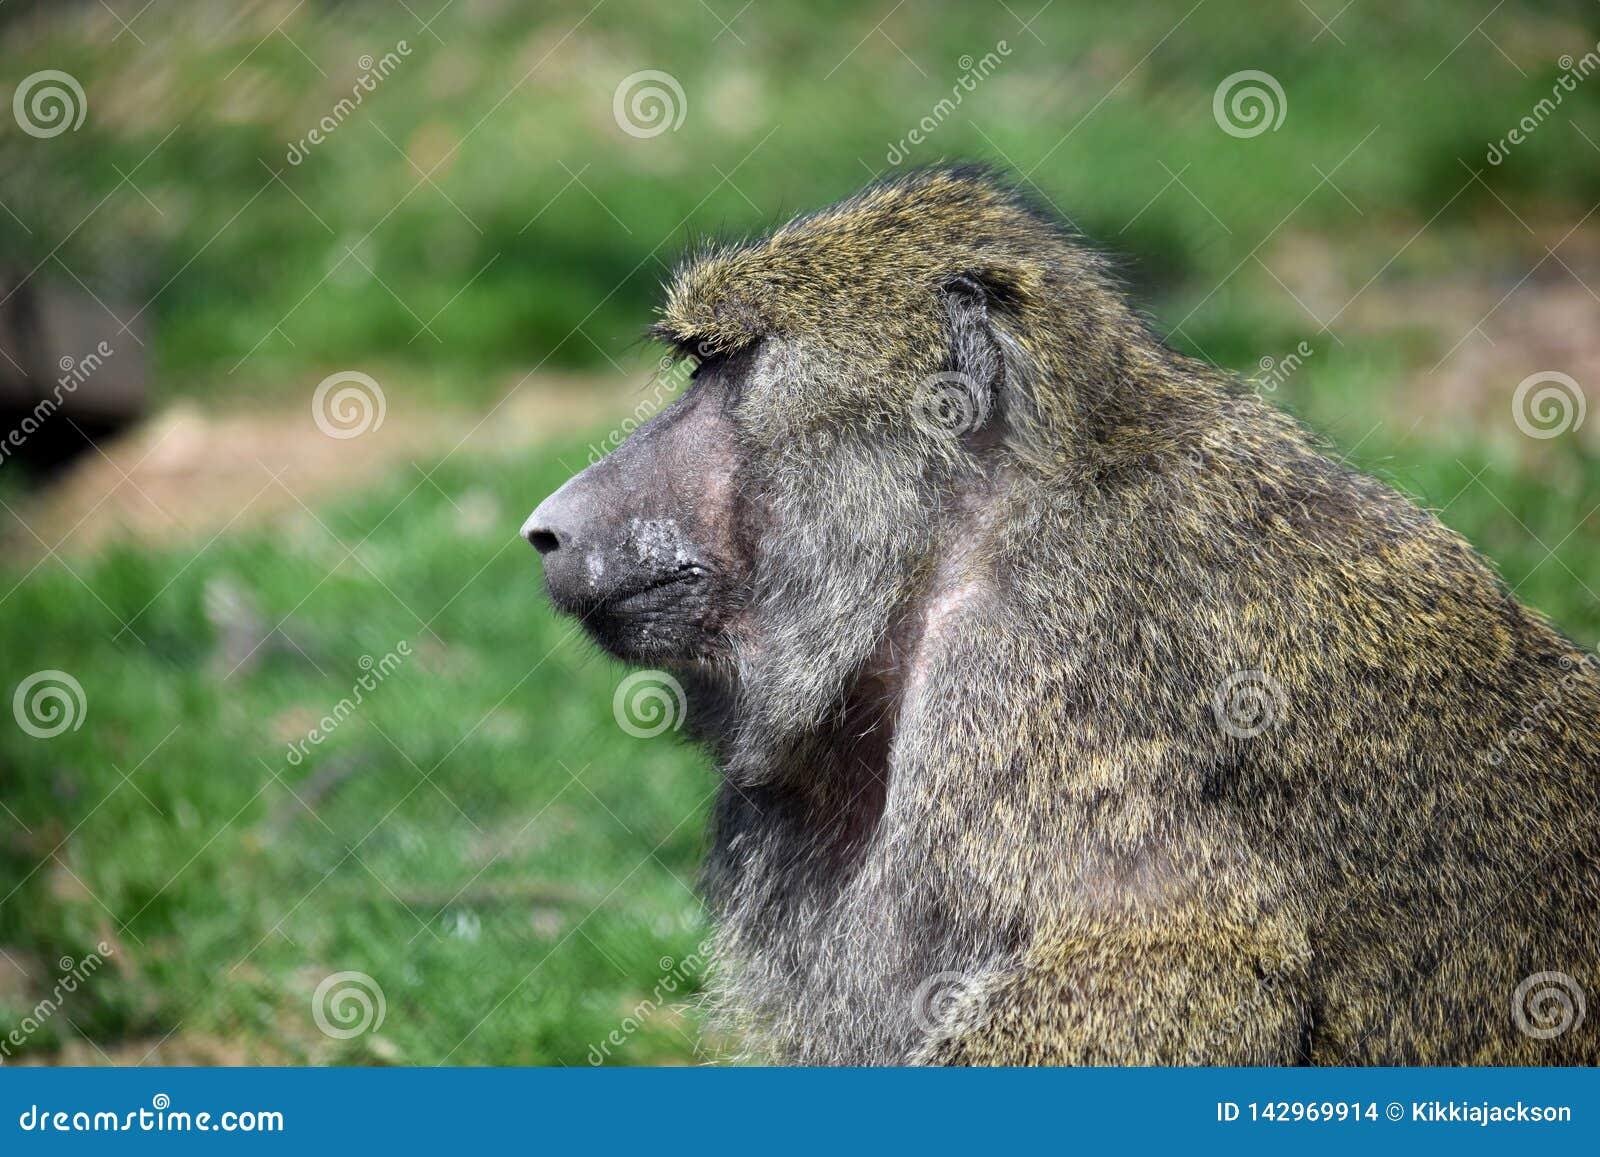 Baboon Monkey Papio Anubis Head Closeup Portrait